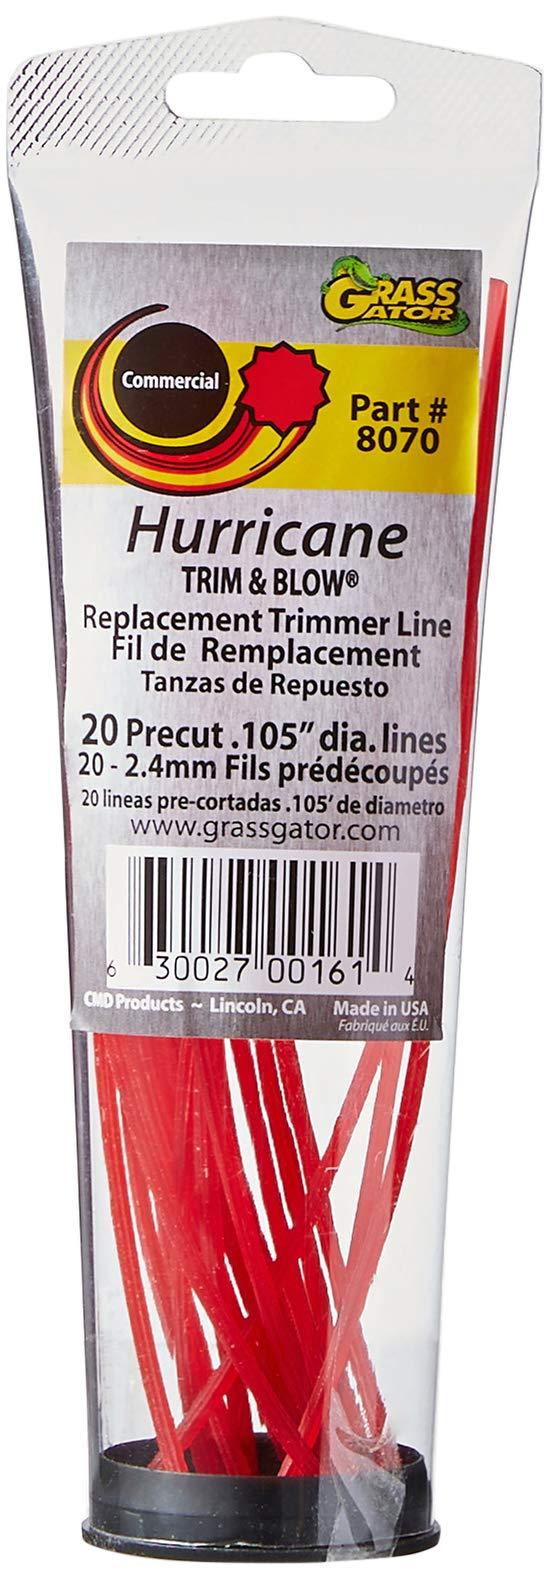 Grass Gator 8070 Hurricane Replacement .105 Line